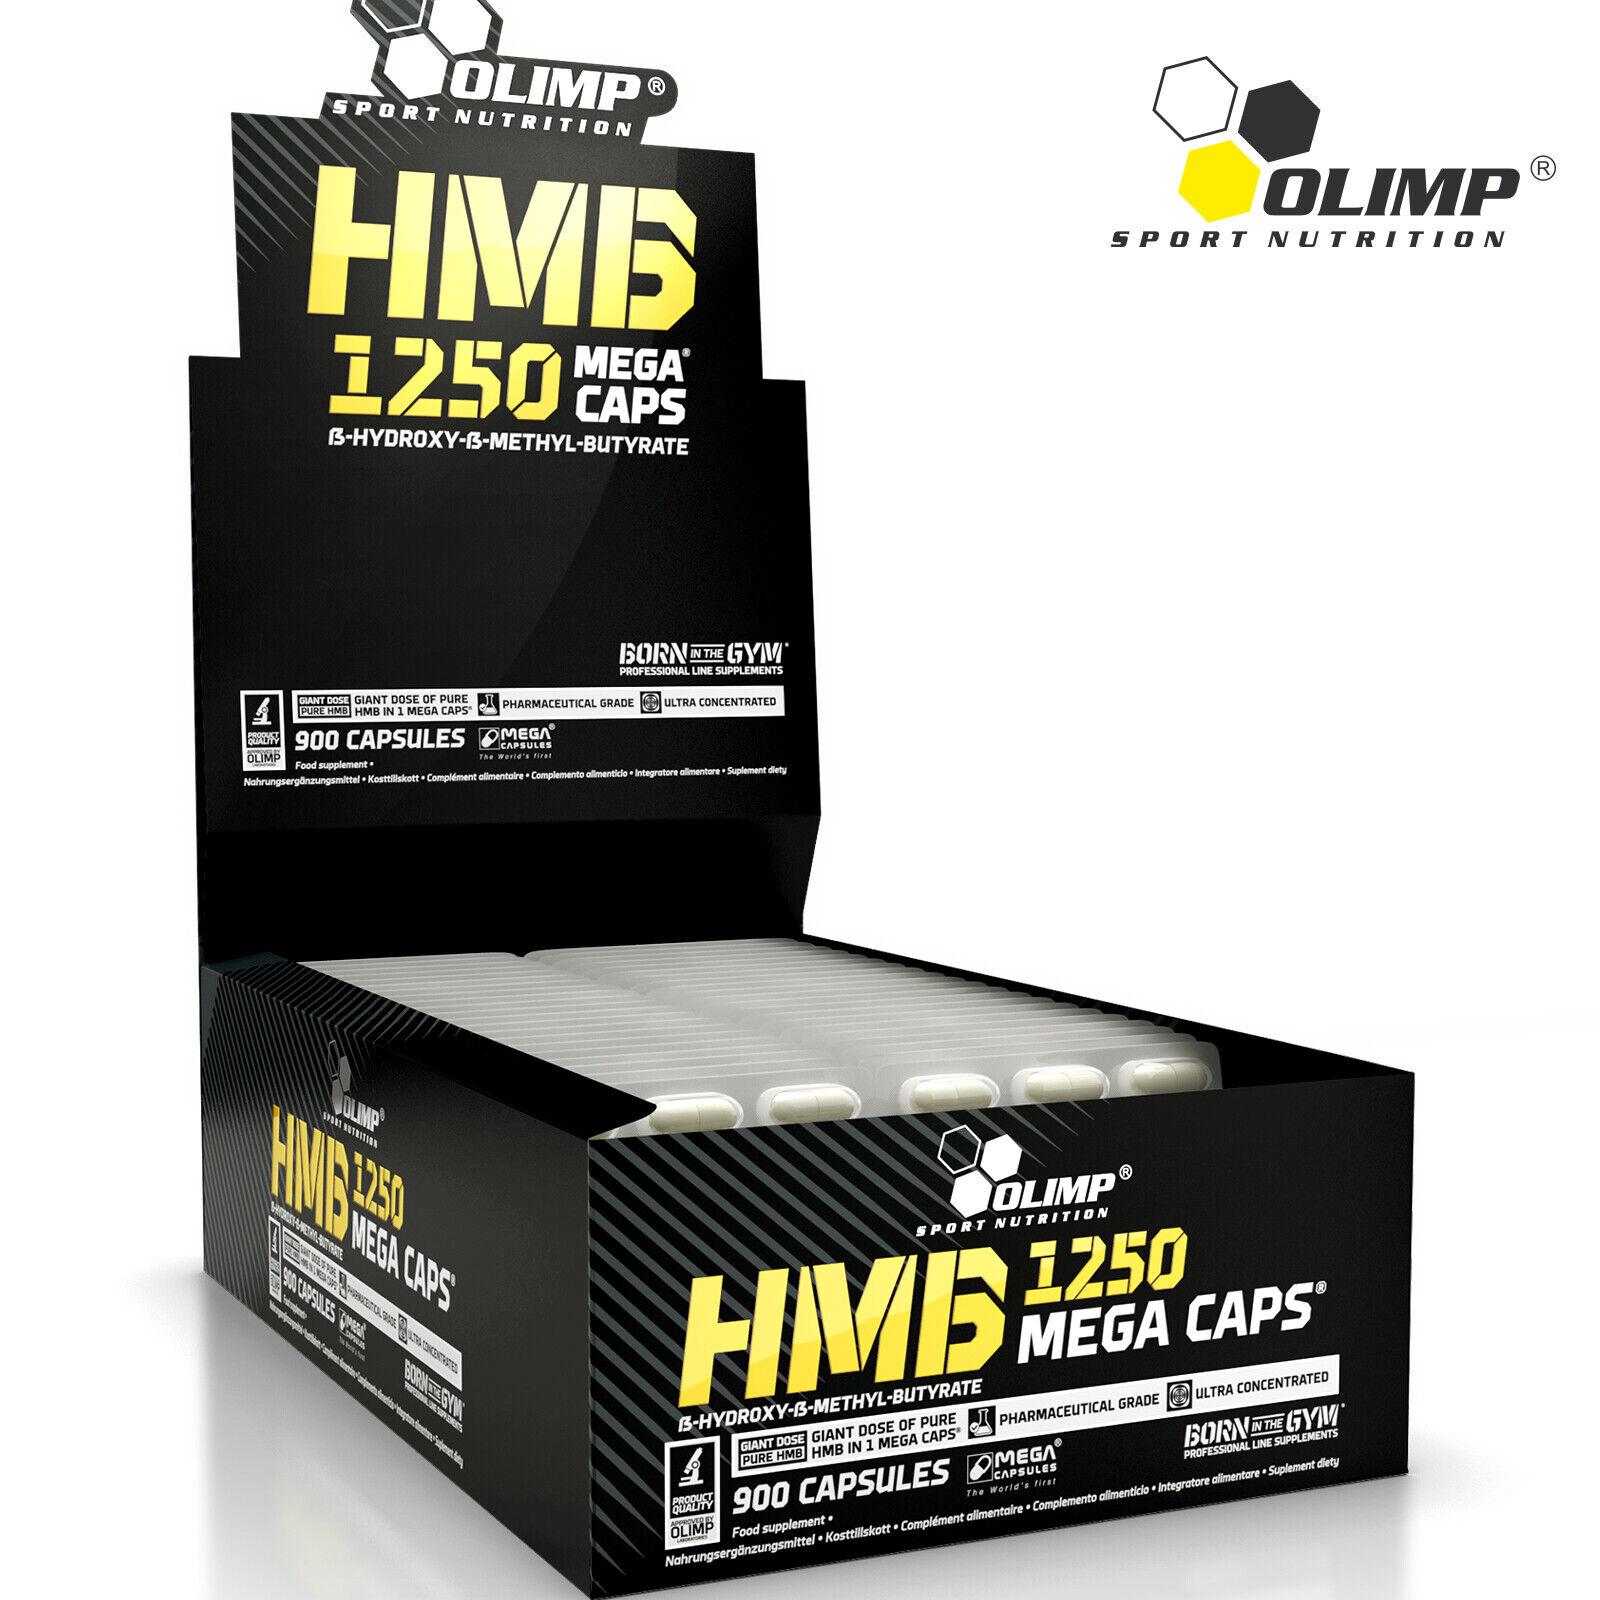 HMB Blisters Anticatabolic Anabolic Fat Burner Lean Ripped Muscle Mass Growth